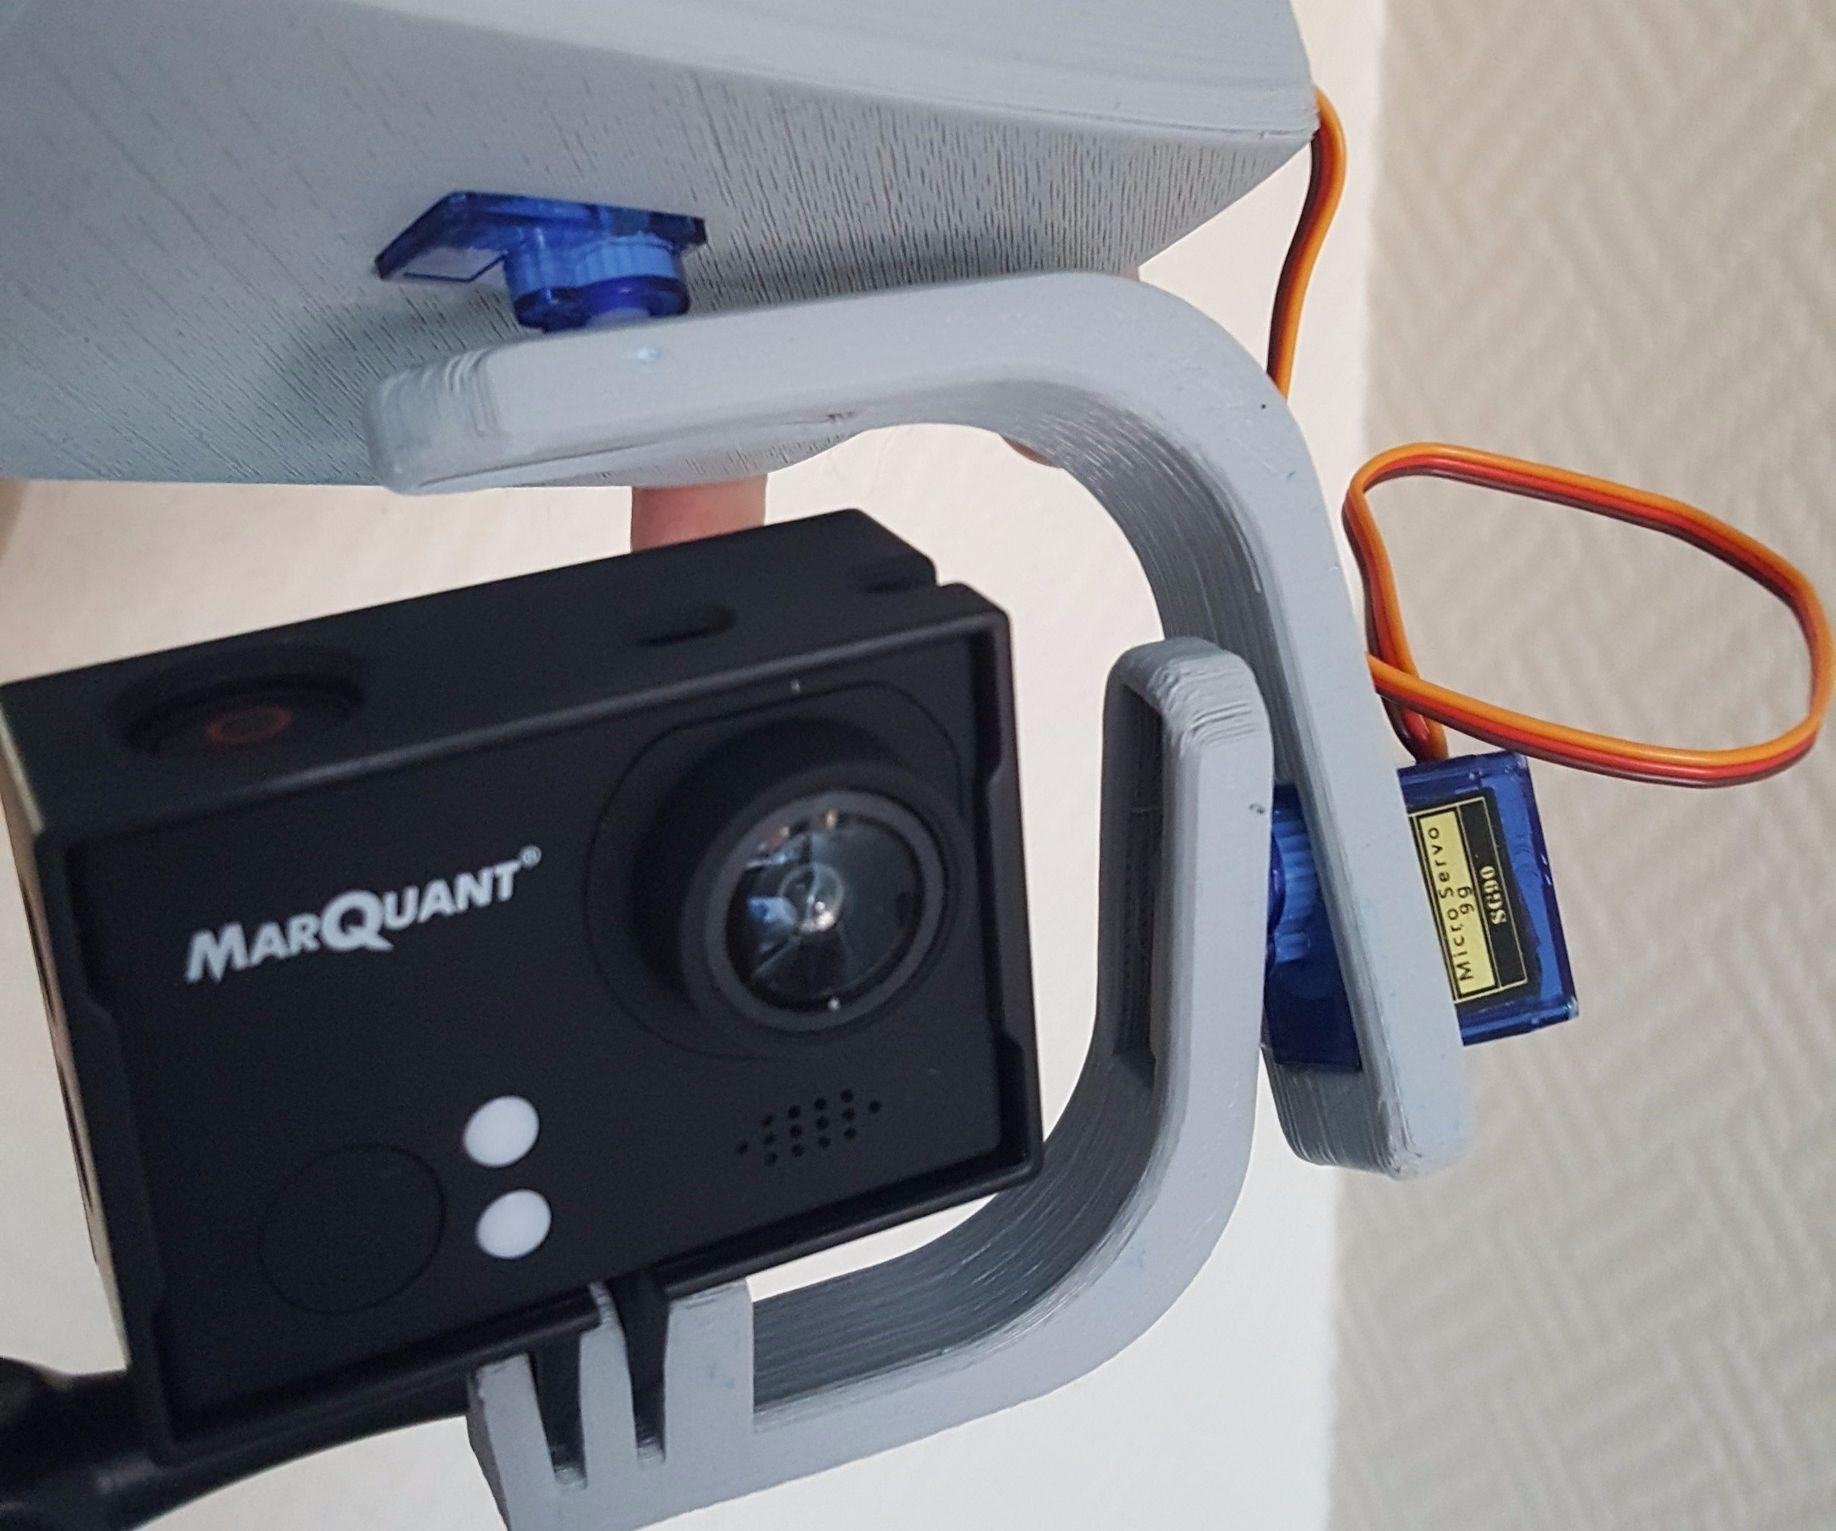 Camera gimbal using micro servos and arduino